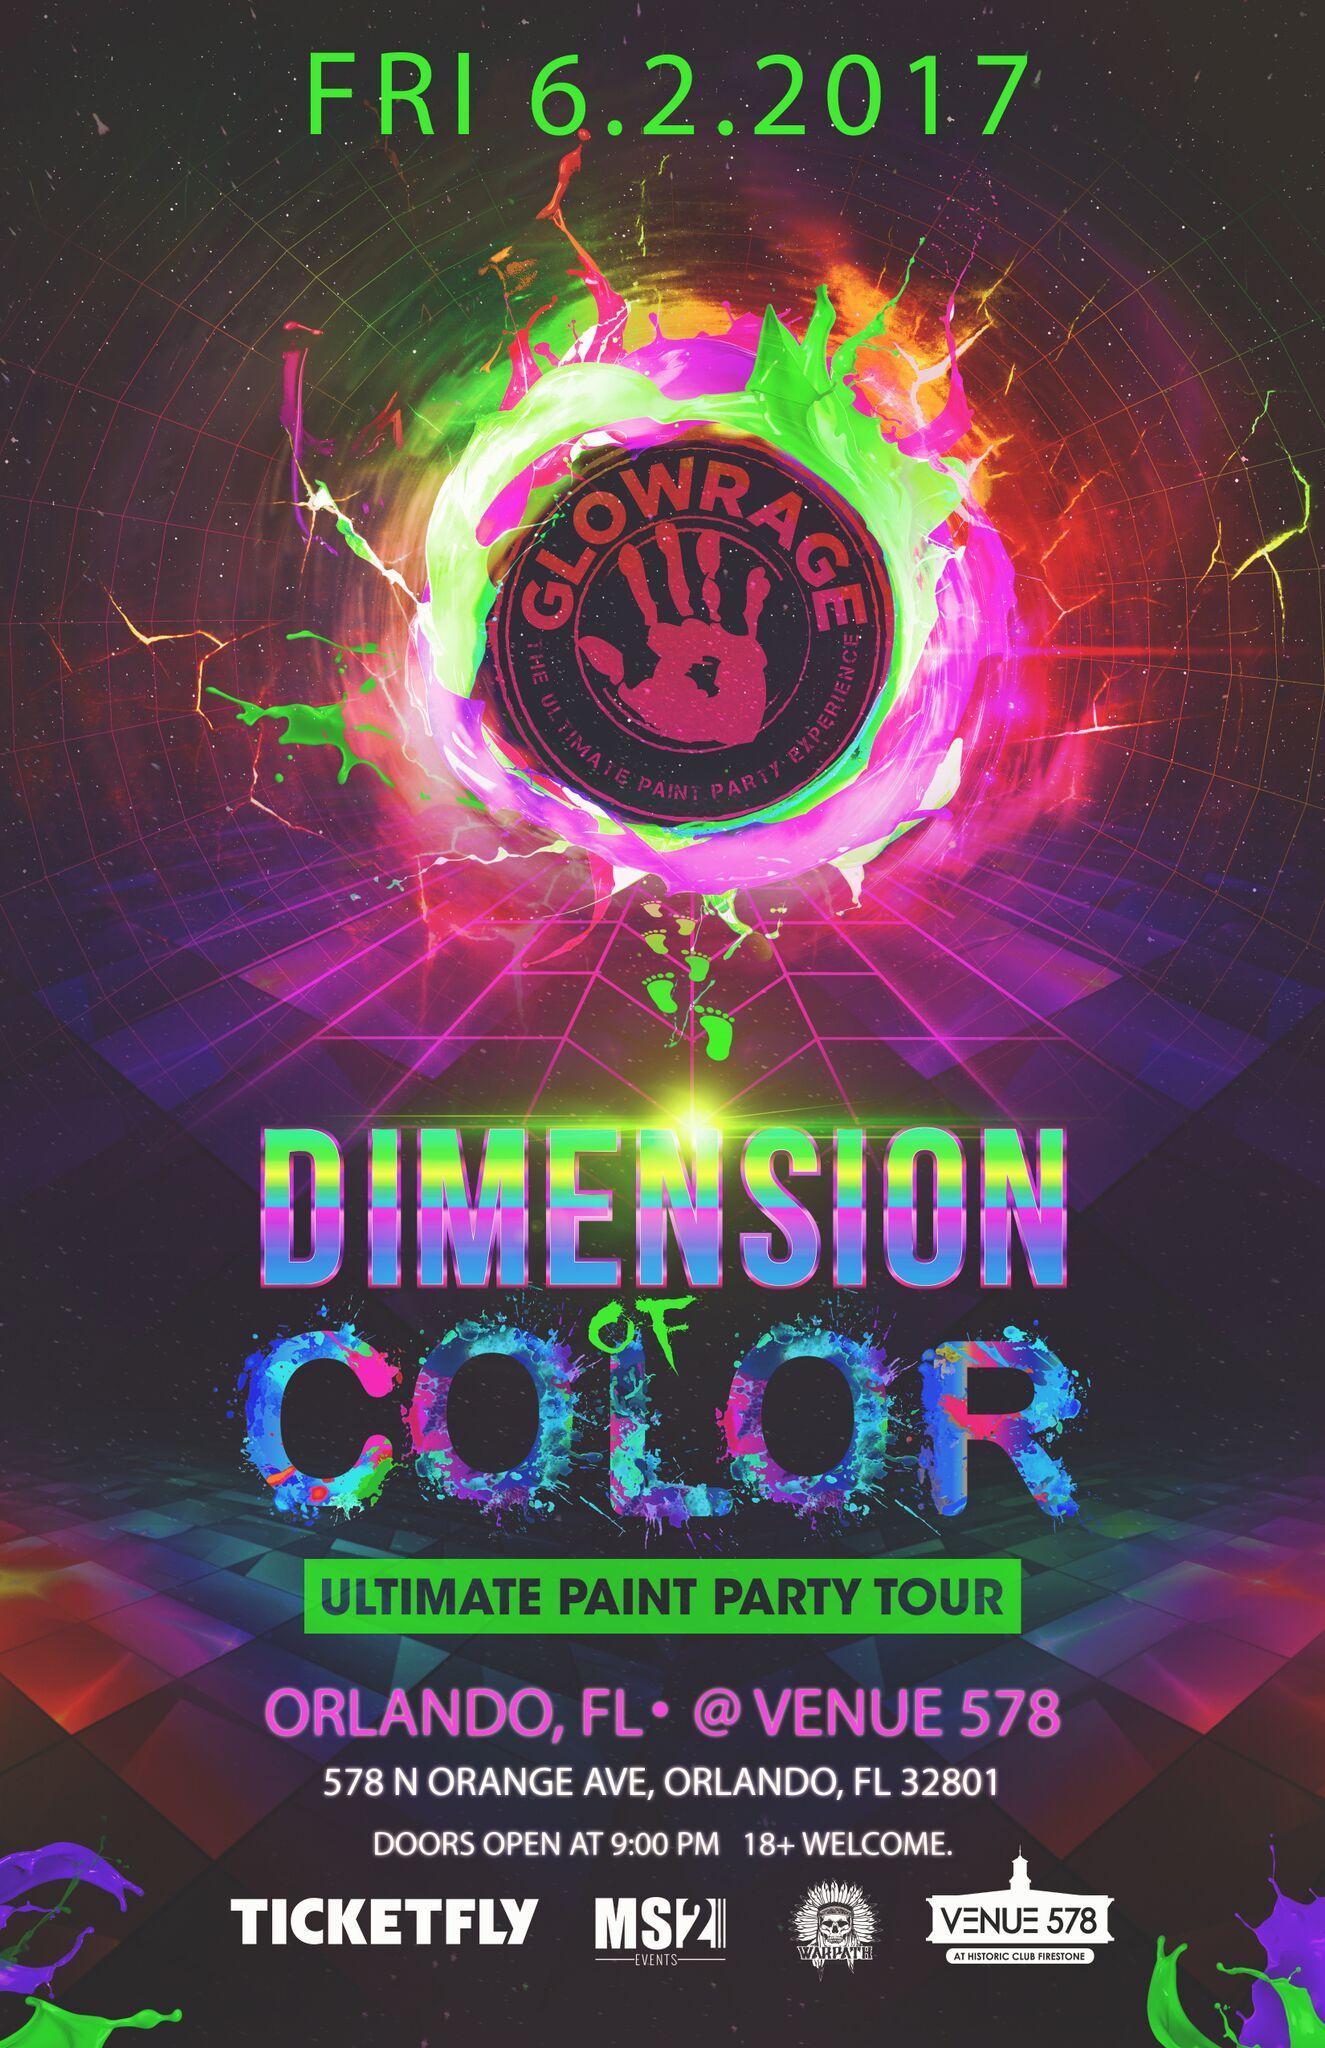 GlowRage Paint Party - Orlando, FL - 6.2.17